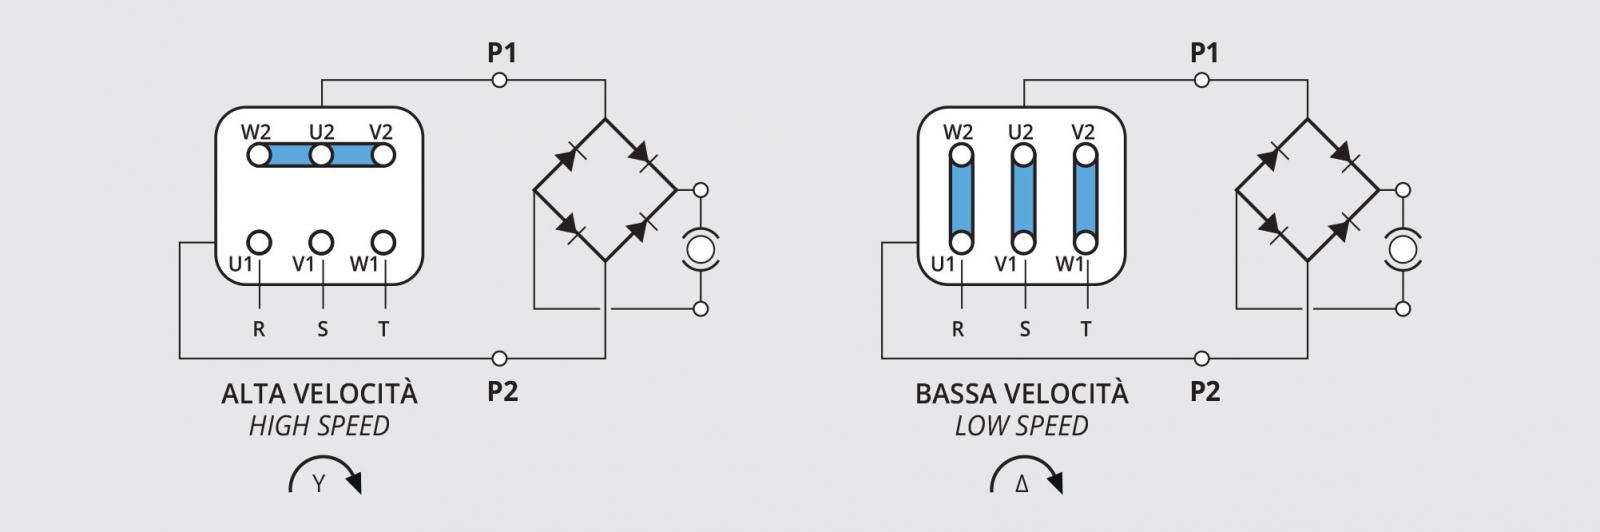 hight resolution of self dc brake three phase motor